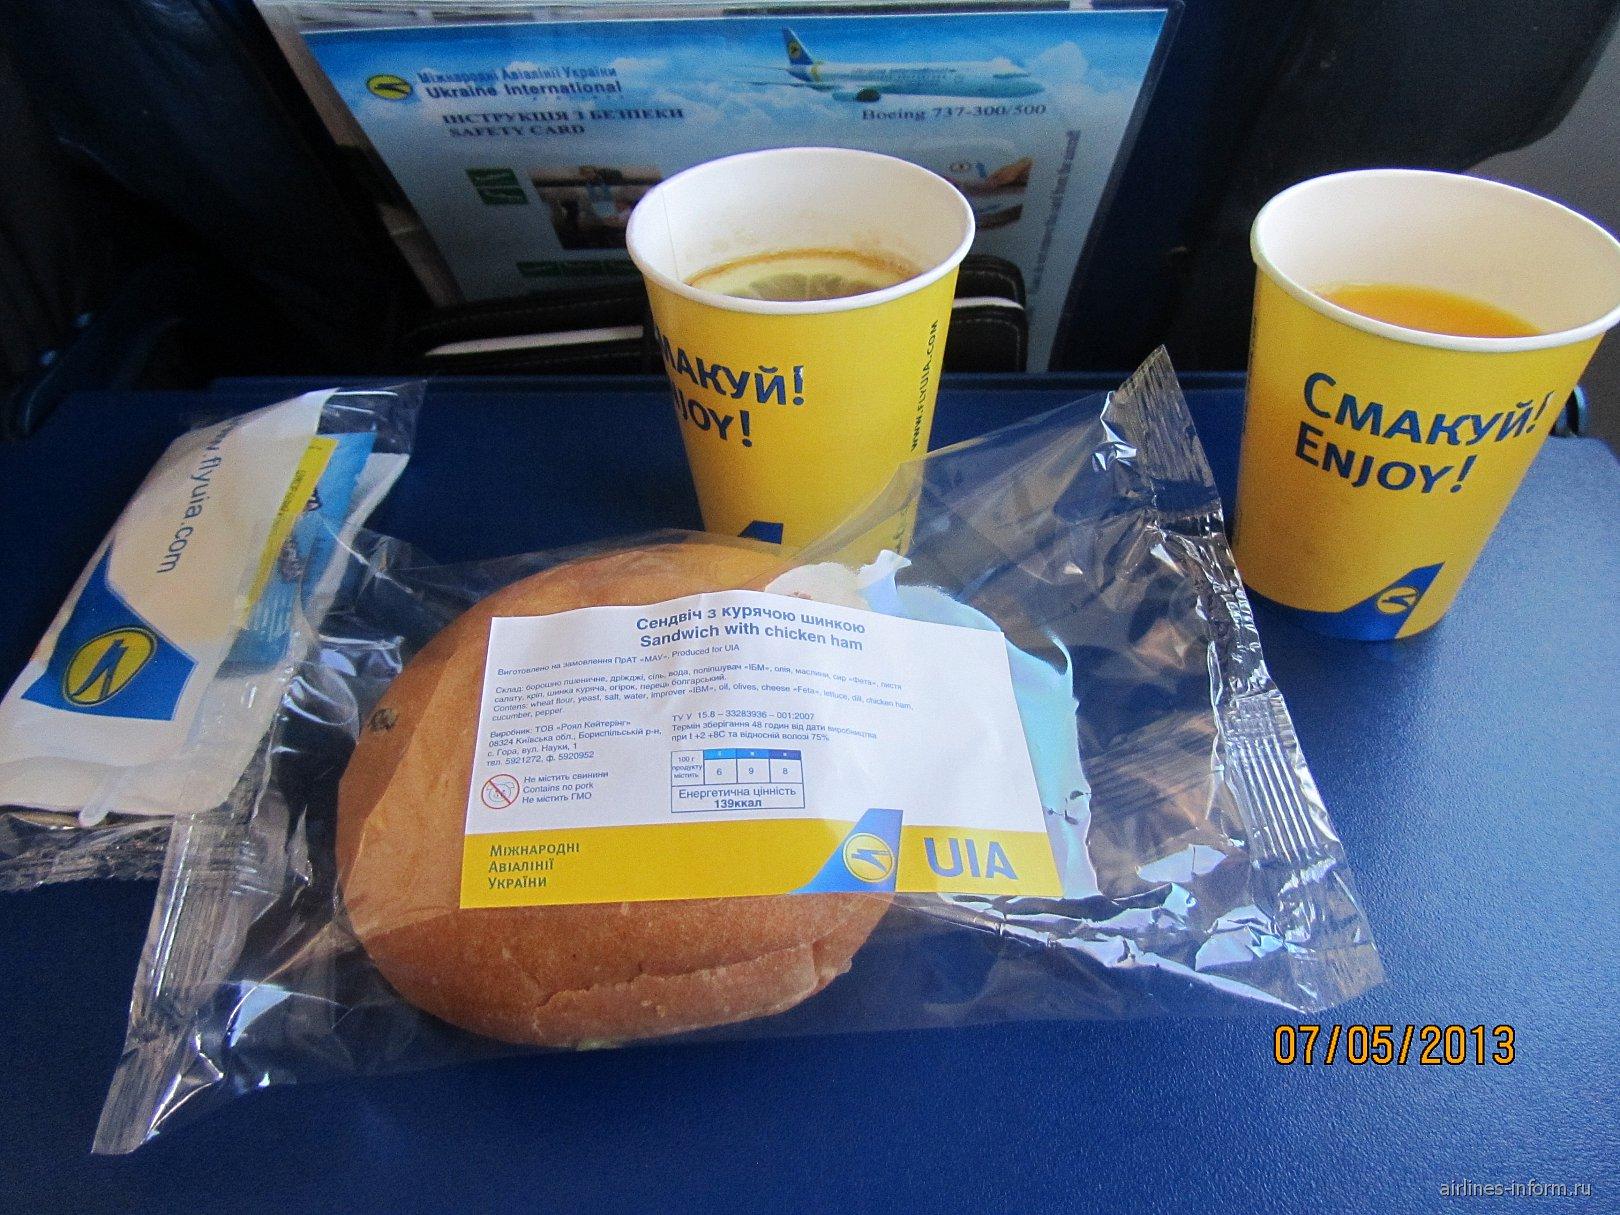 Питание на рейсе МАУ Новосибирск-Киев